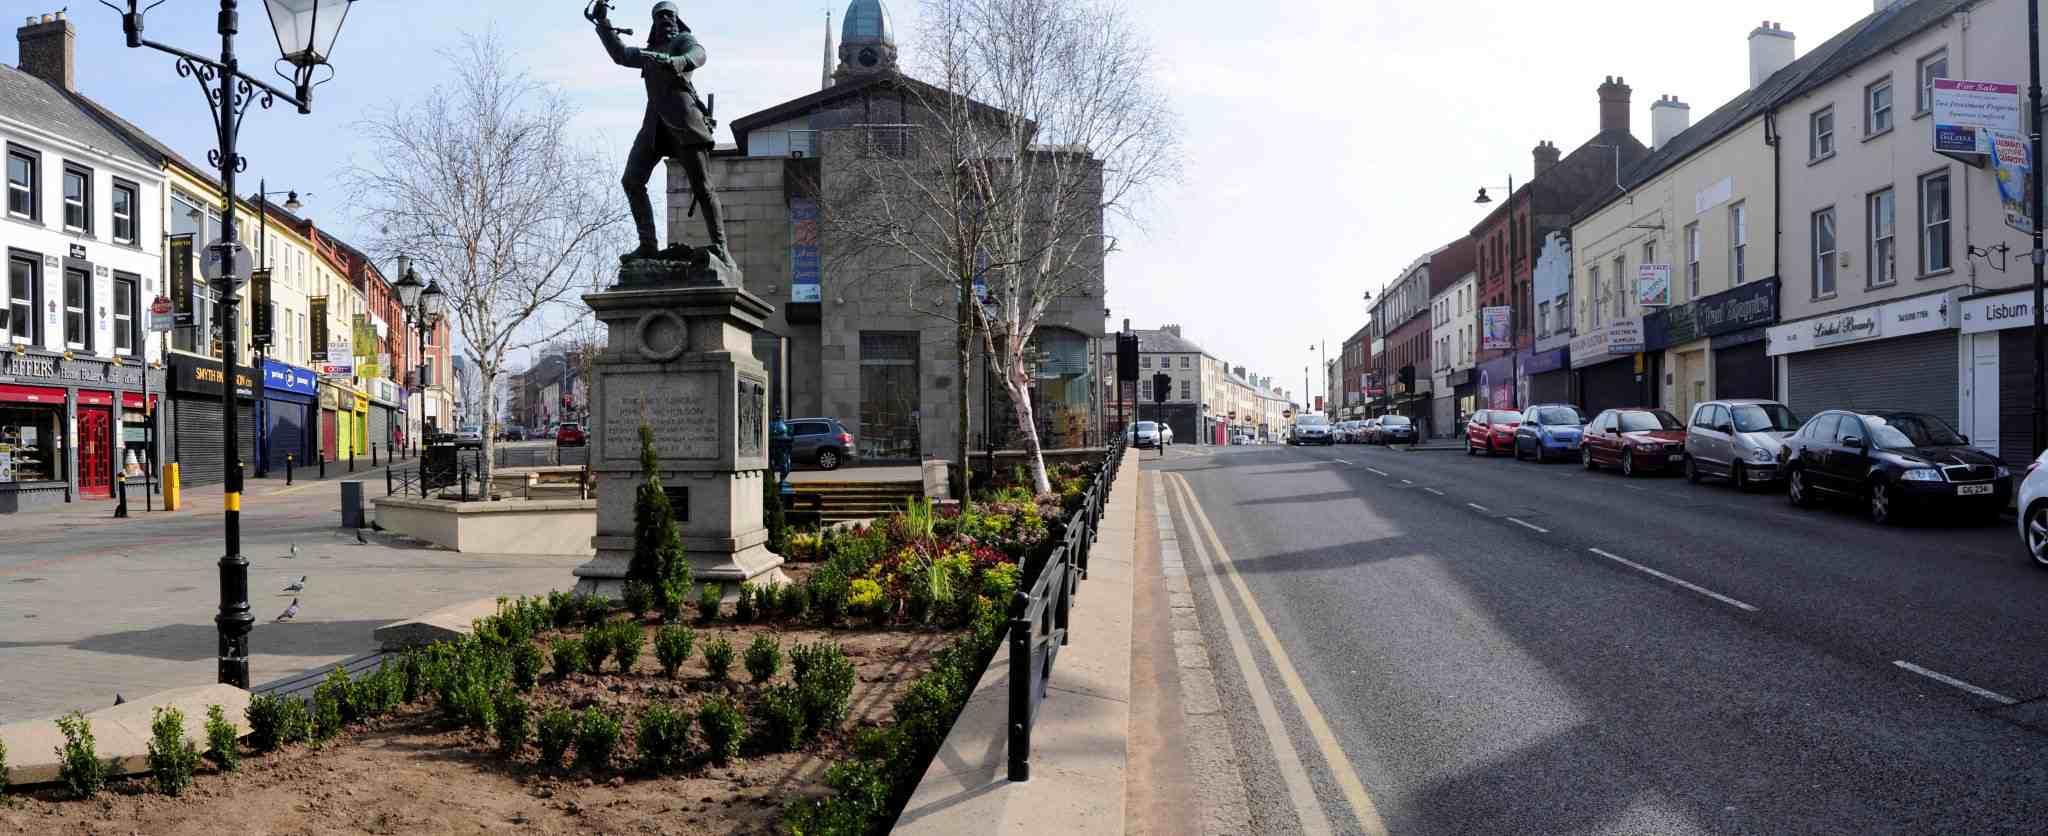 Lisburn, Northern Ireland